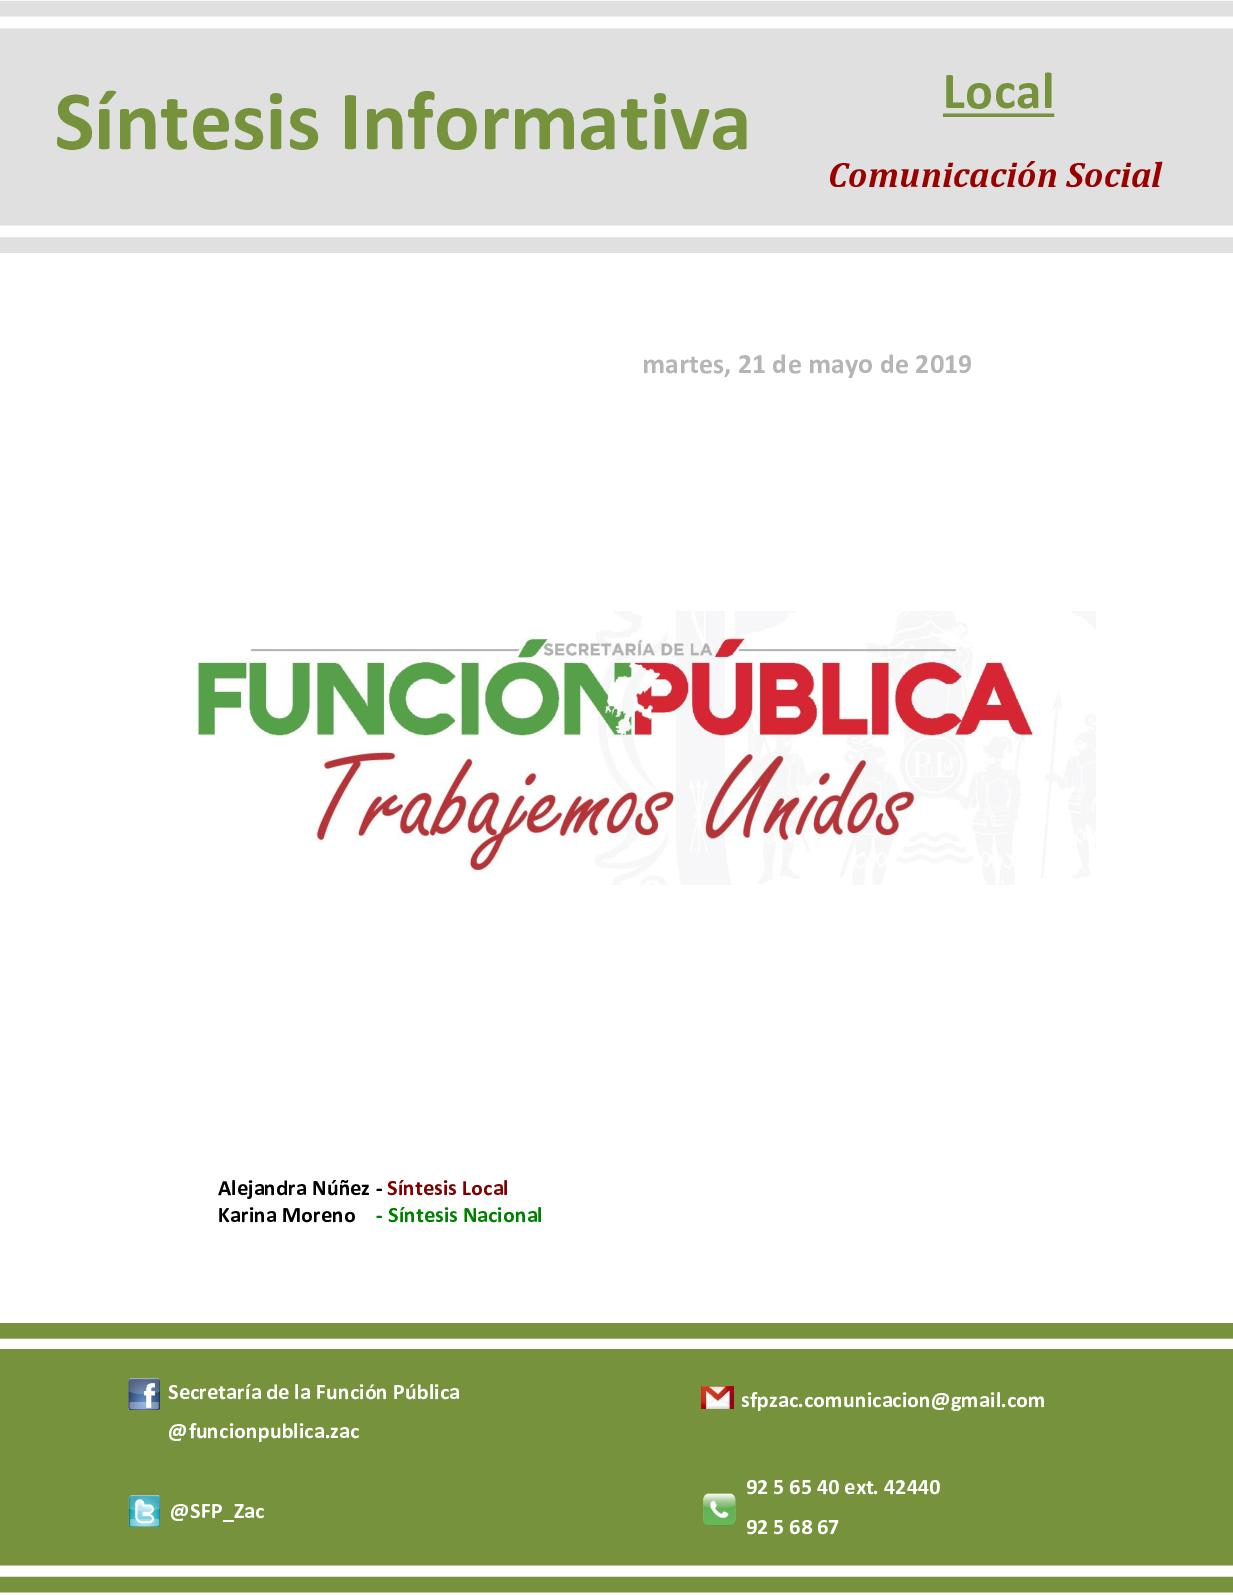 Síntesis Local-Nacional de Comunicación Social de la SFP 21-05-2019